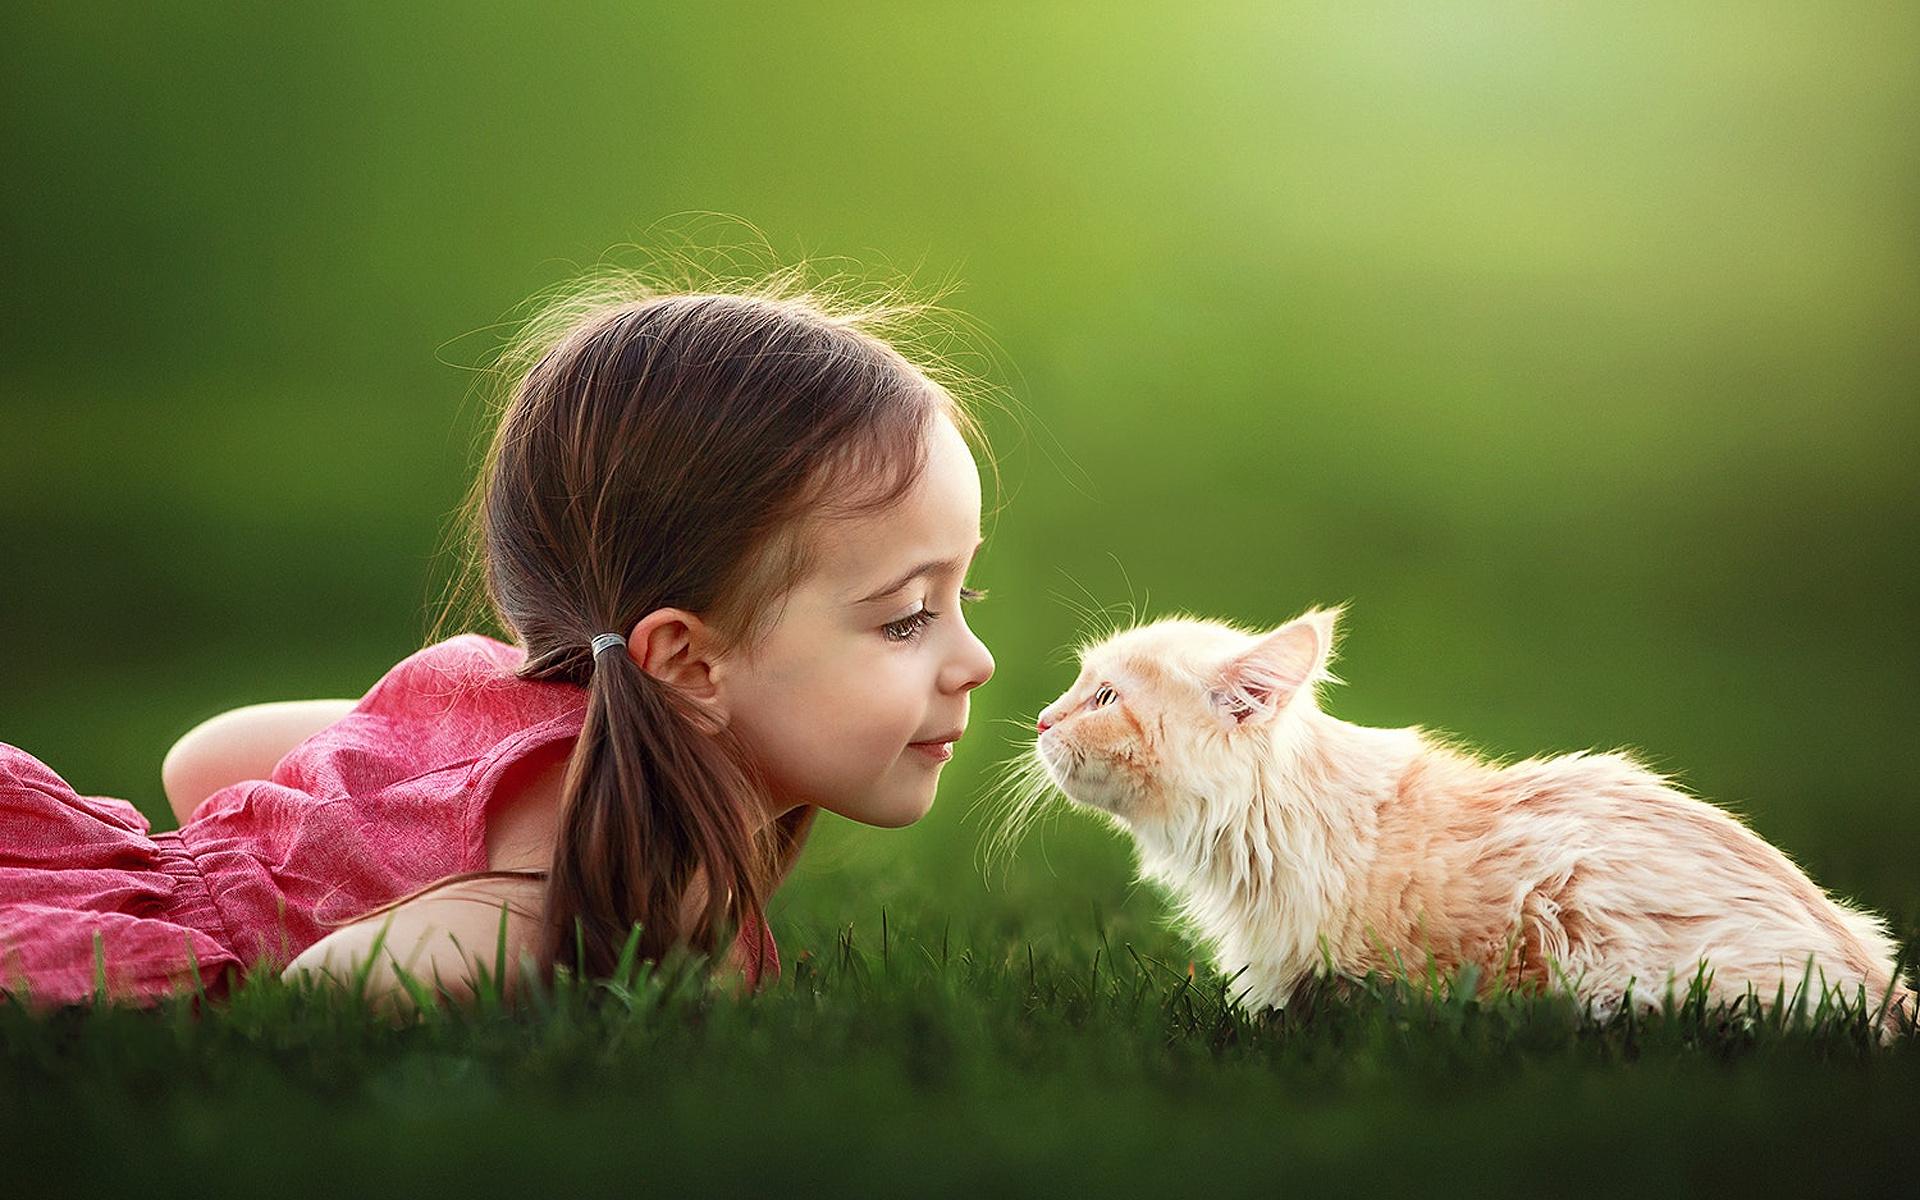 Дети и кошки красивое фото